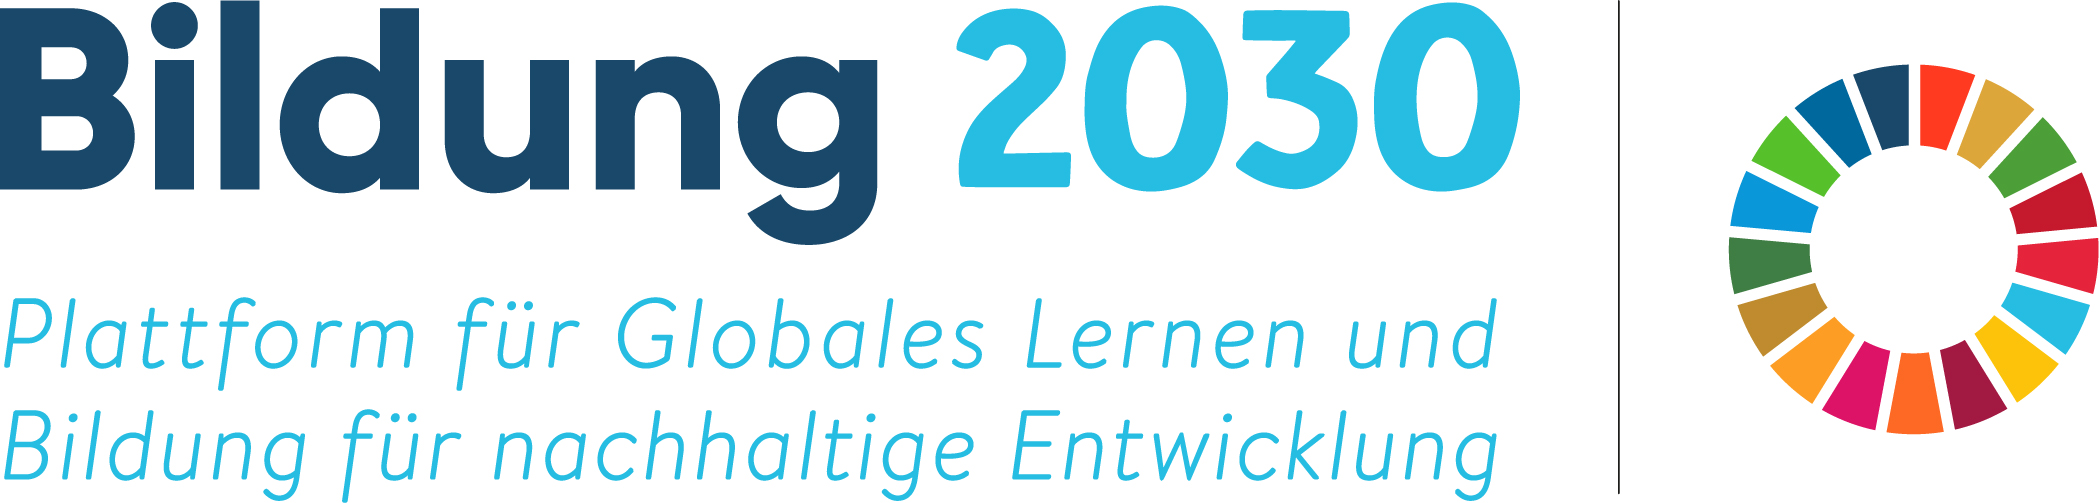 Logo_Bildung2030_WEB